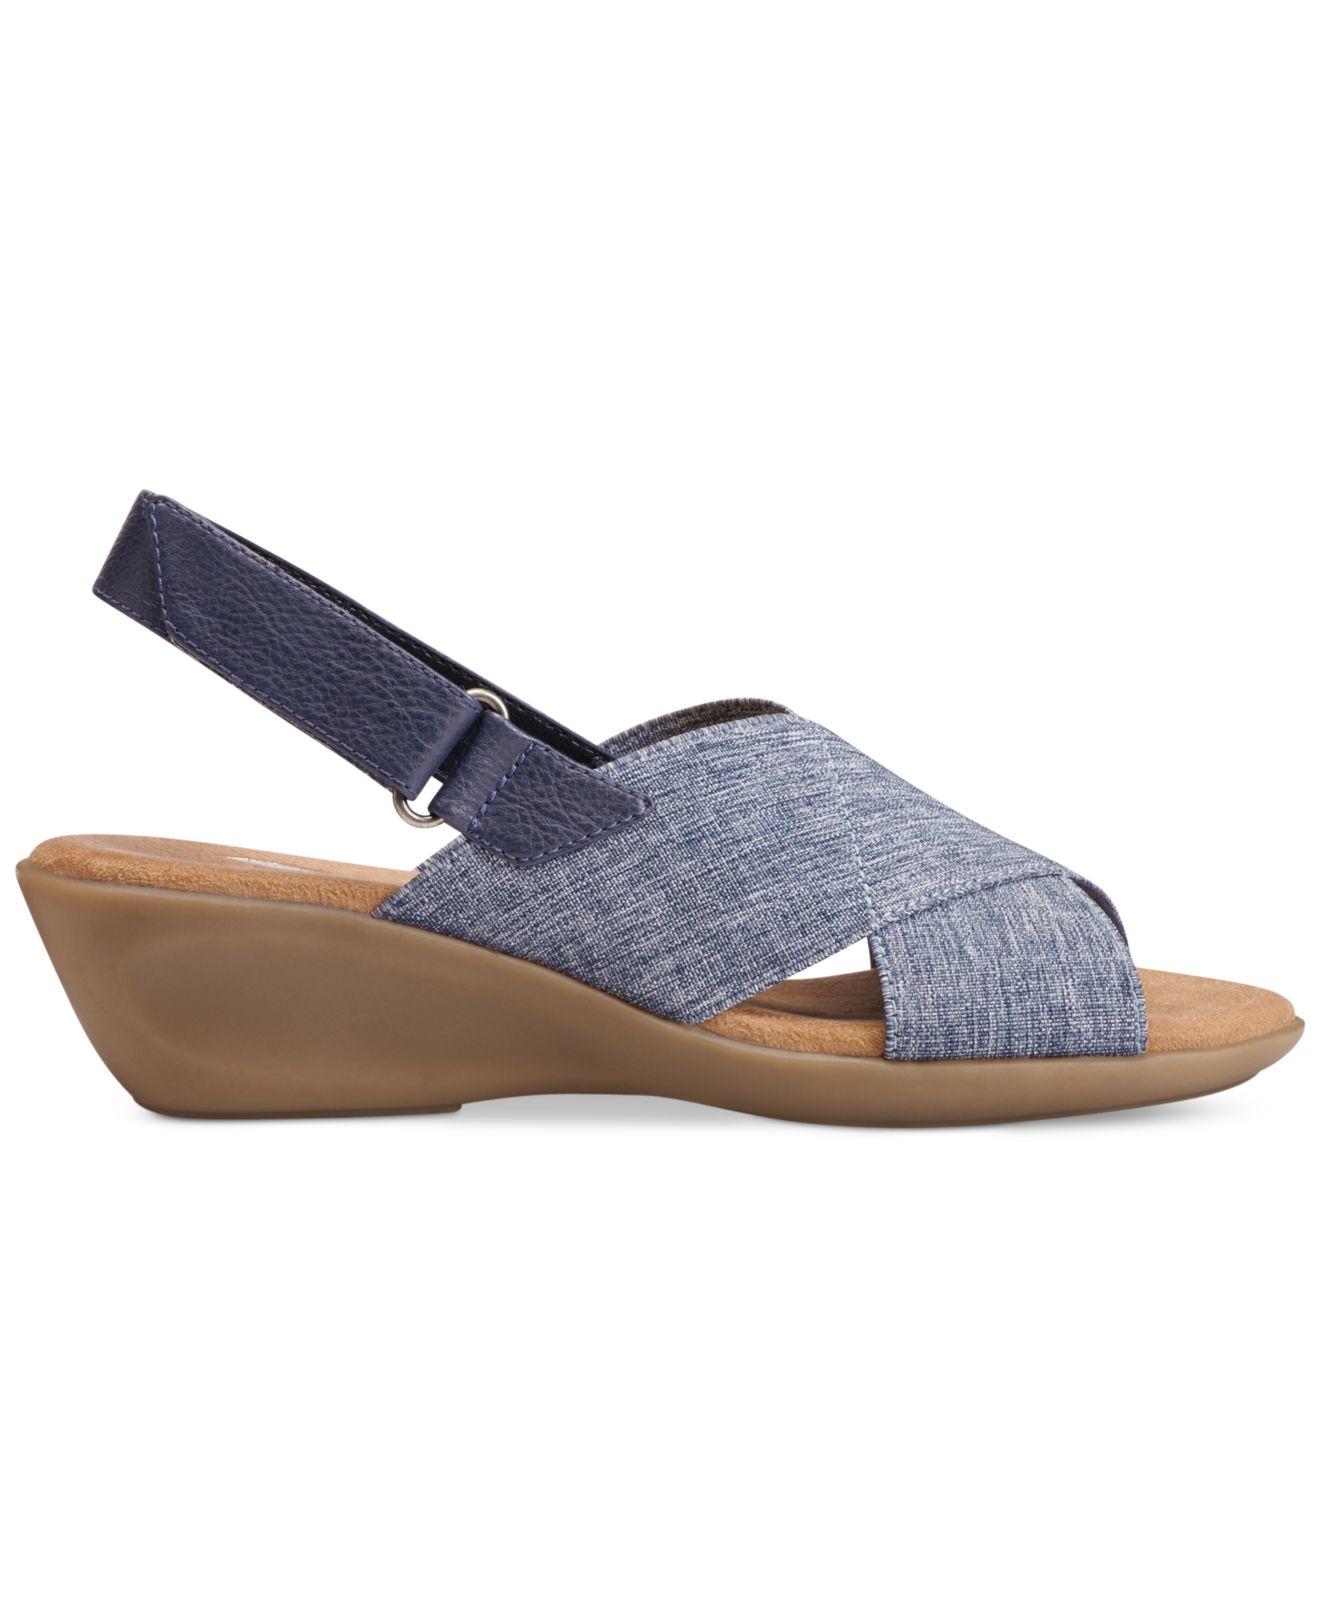 aerosoles badlands wedge sandals in beige chamb blue lyst